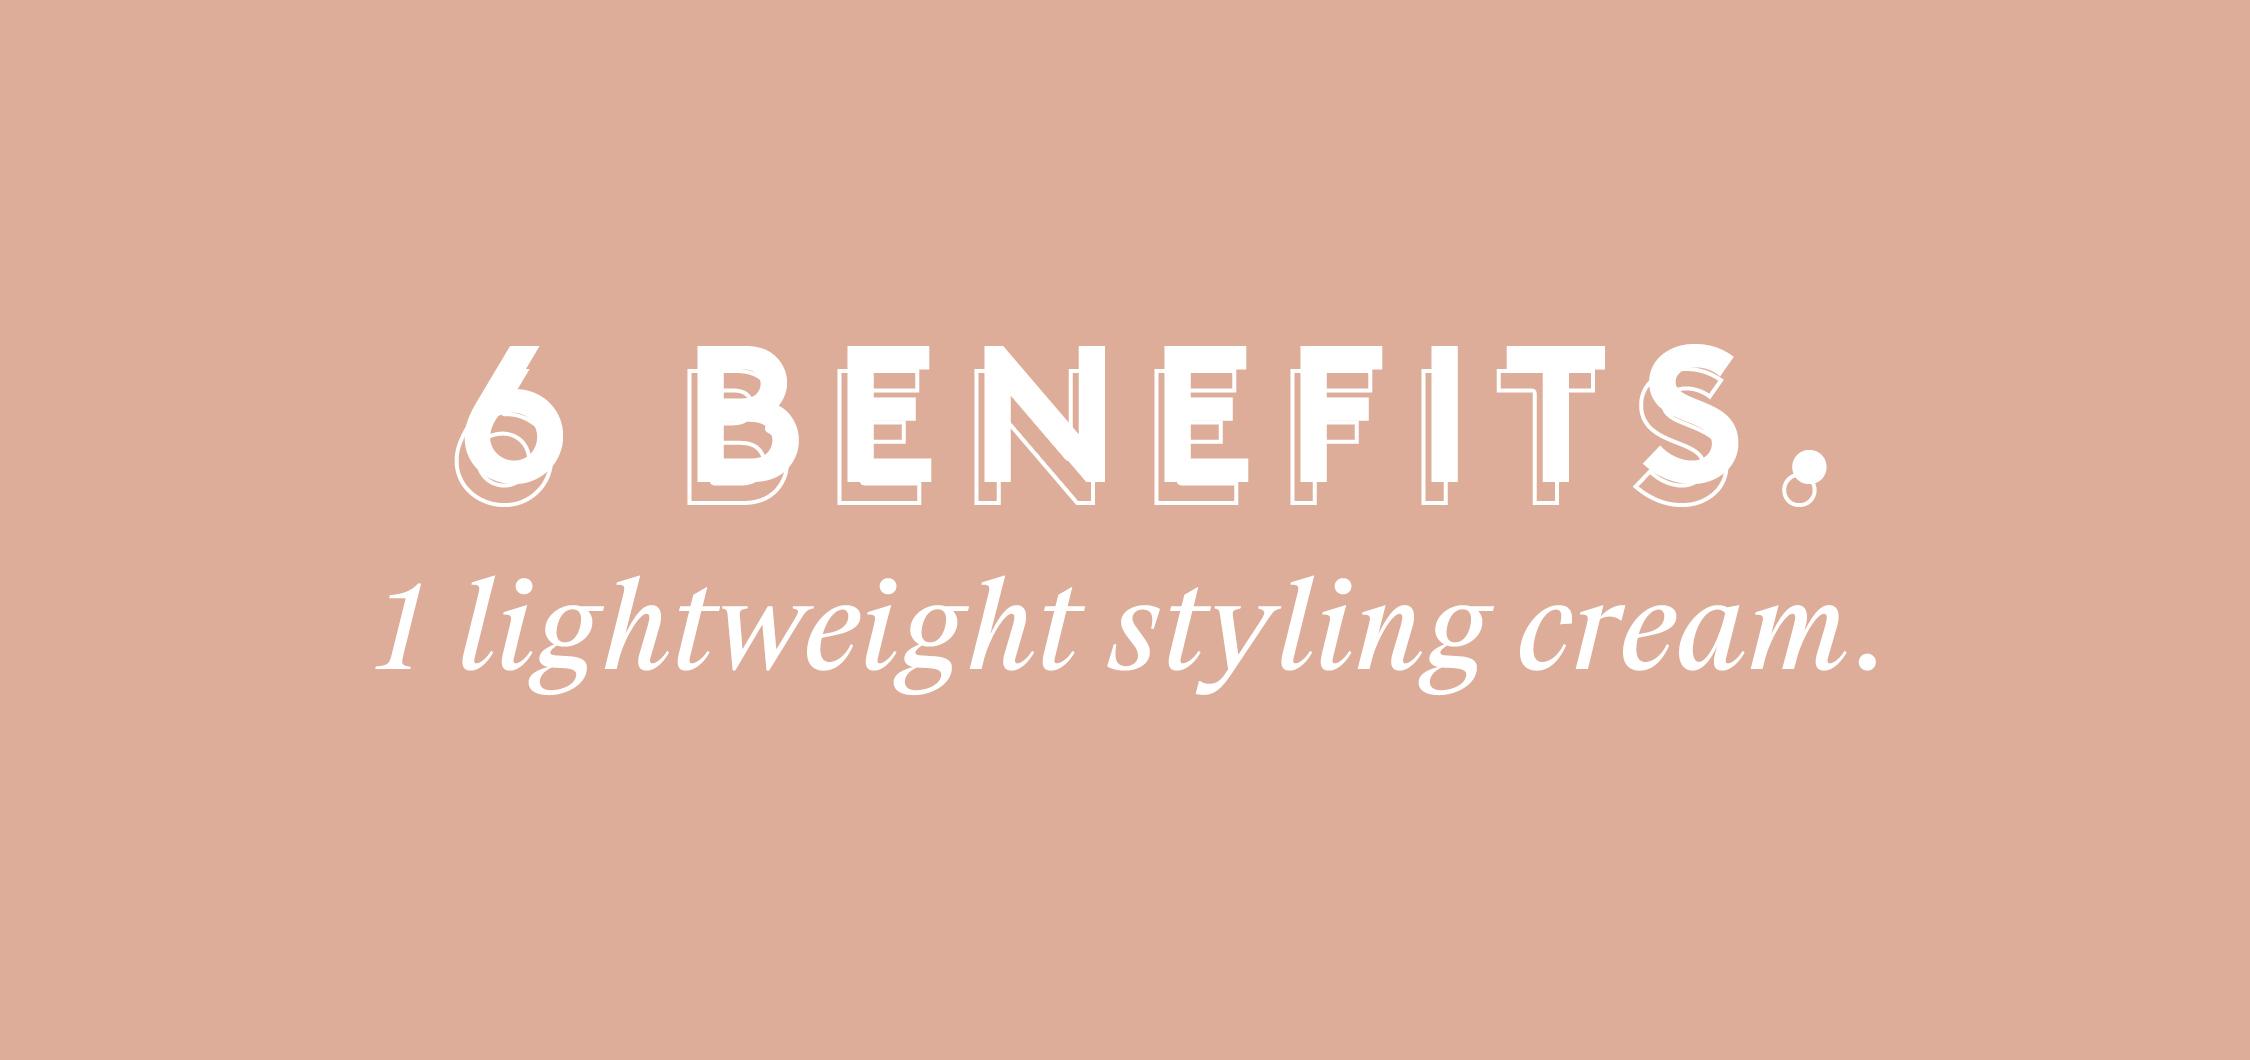 6 Benefits, 1 Lightweight Styling Cream